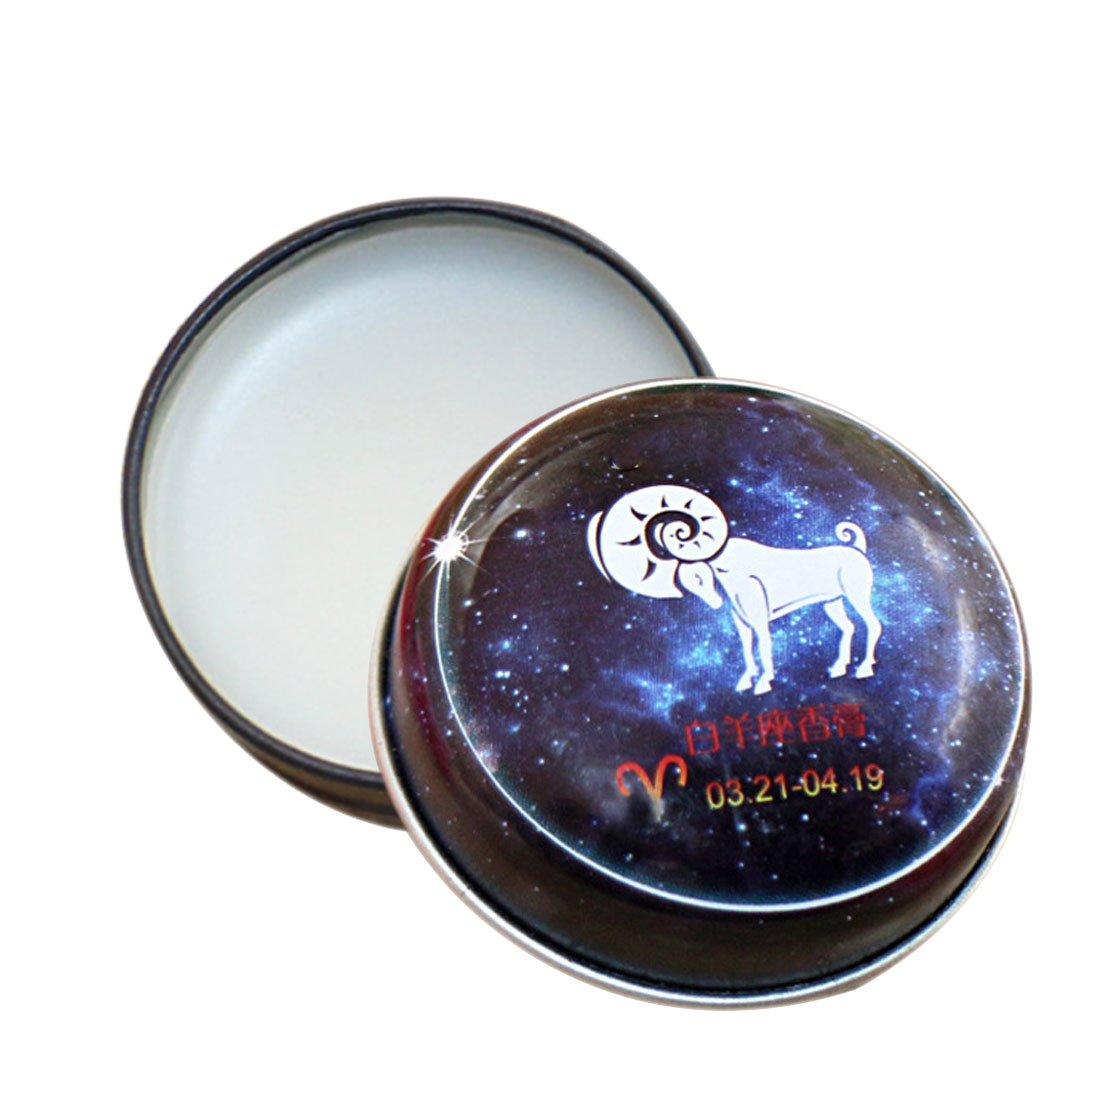 TOP Sale 1 PC Unisex Magic Zodiac Fragrance 12 Signs Constellation Deodorant Perfumed Solid Portable Tin Box Balm